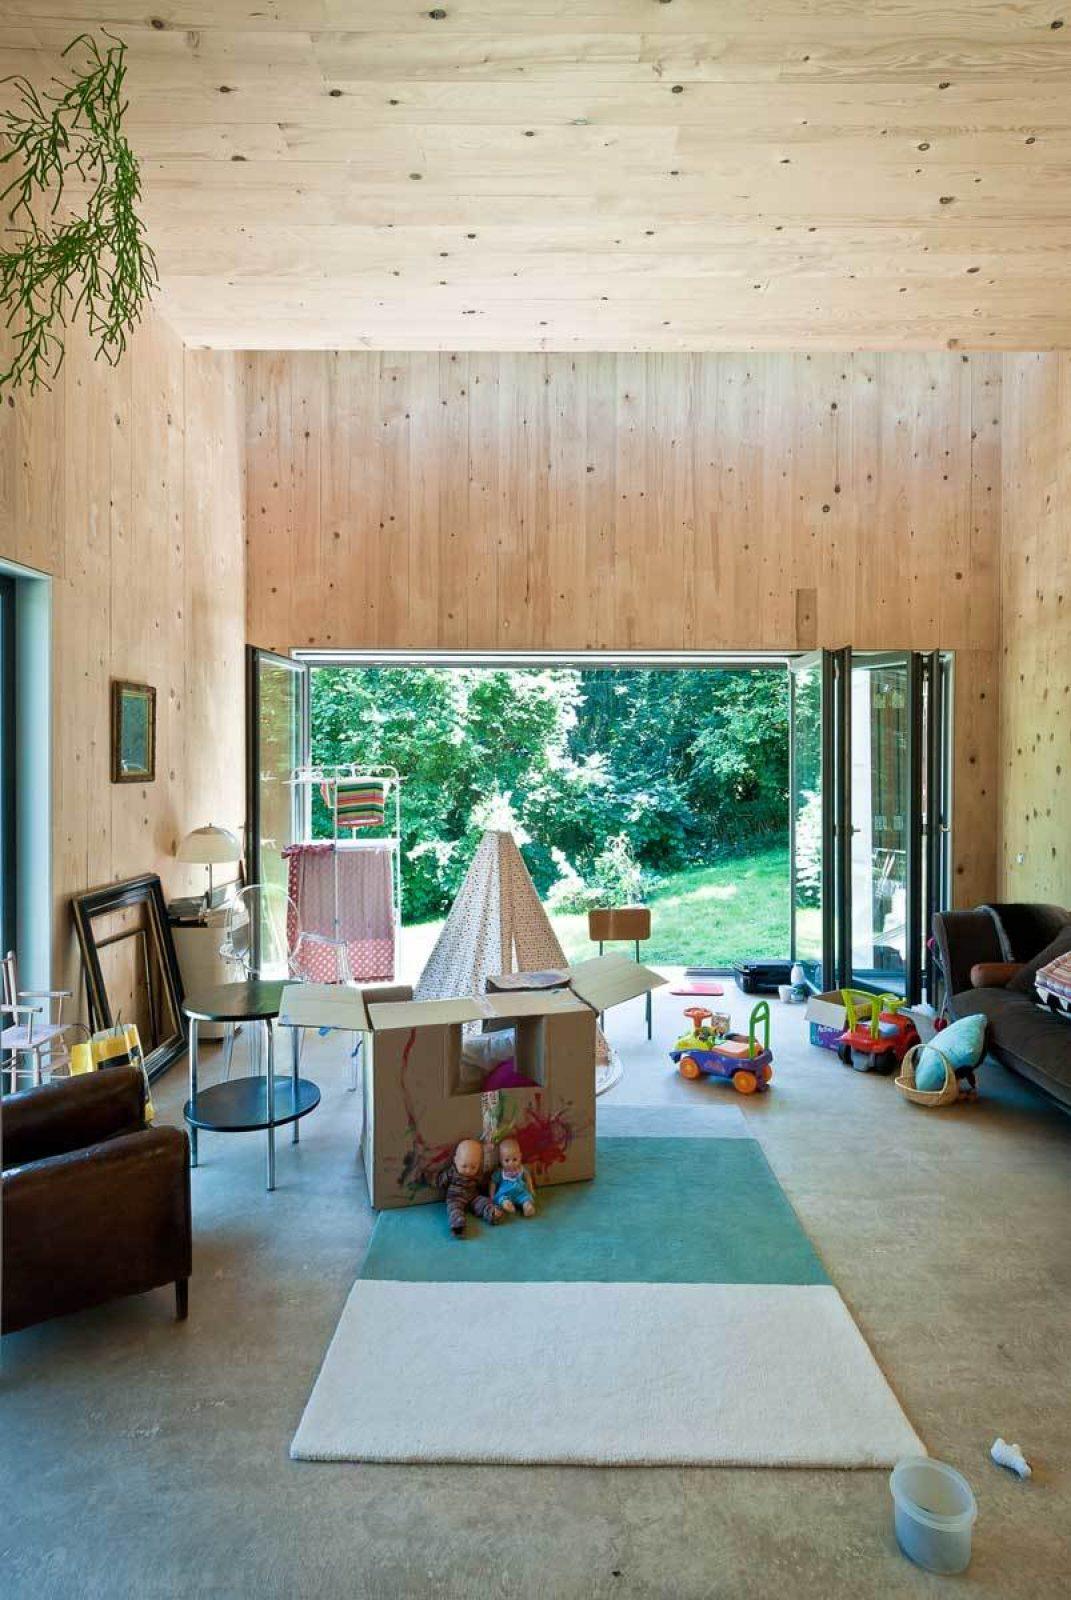 Lyon 11 Interior Living